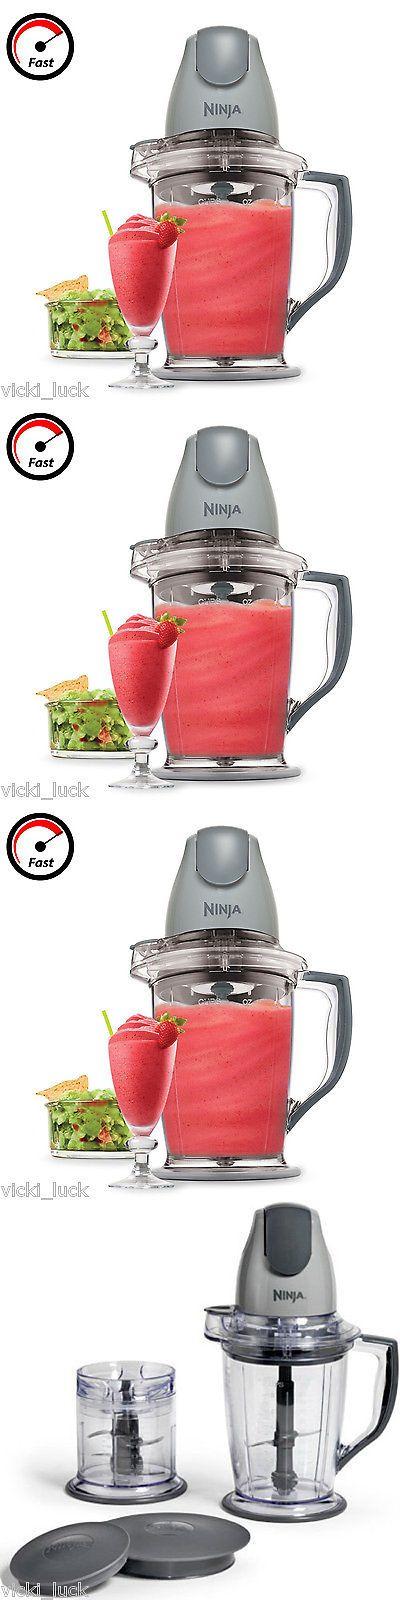 appliances: Ninja Master Prep Blender Food Processor Chopper Drink Mixer Smoothie Maker -> BUY IT NOW ONLY: $31.25 on eBay!